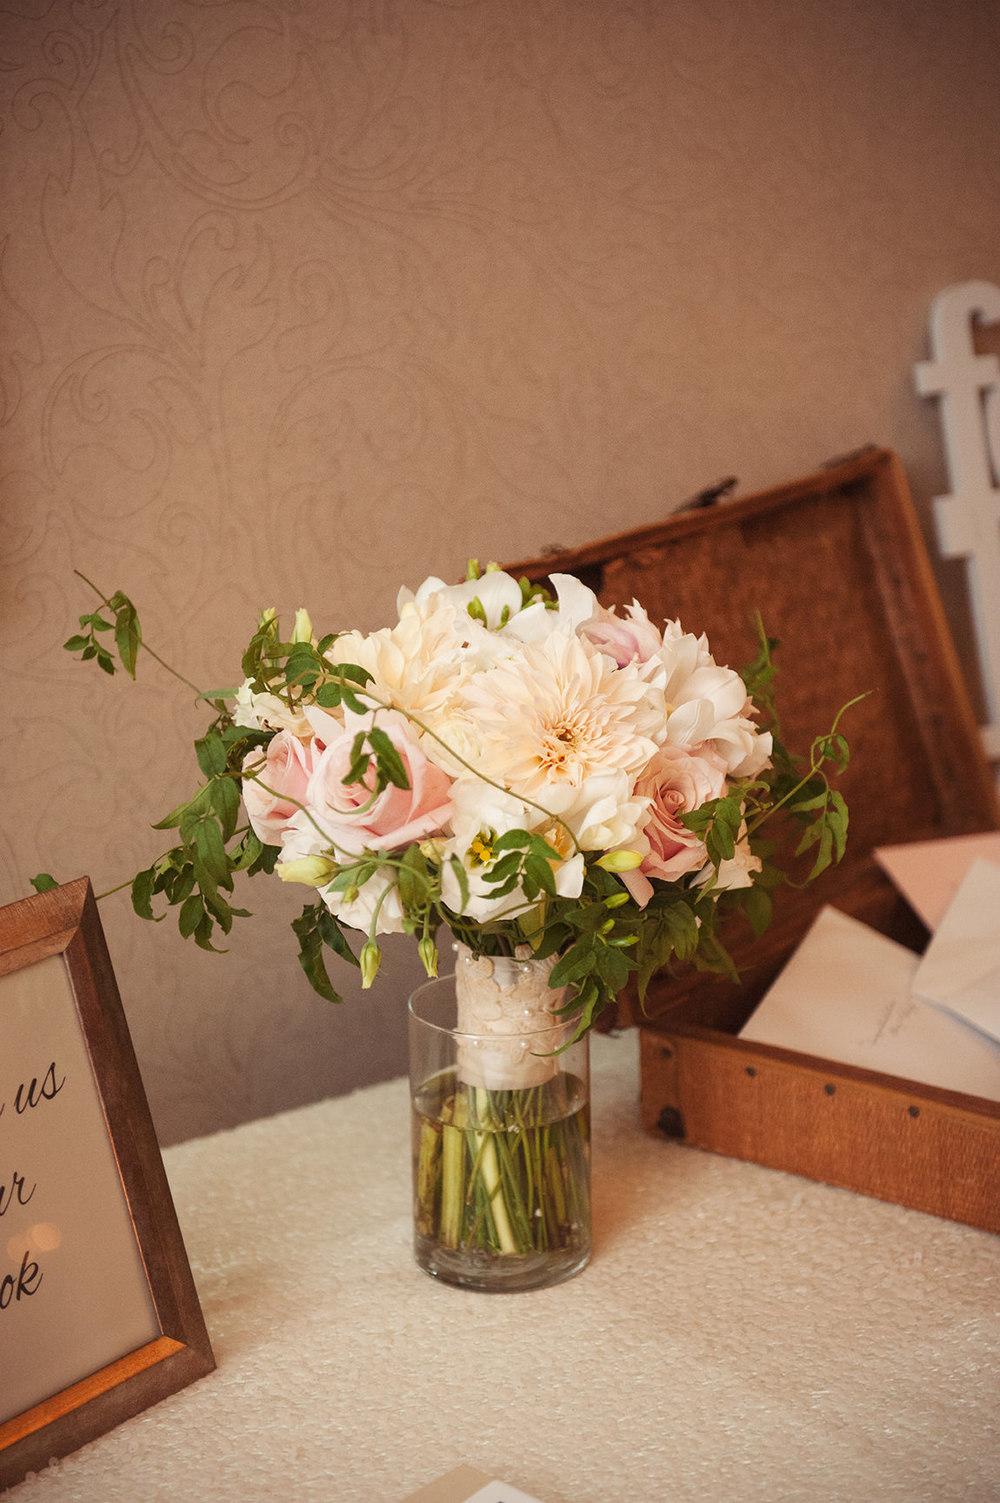 St-Catharines-Wedding-Stone-Mill-Inn-Amy-Darryl-photography-by-Morgan-Falk-106.JPG